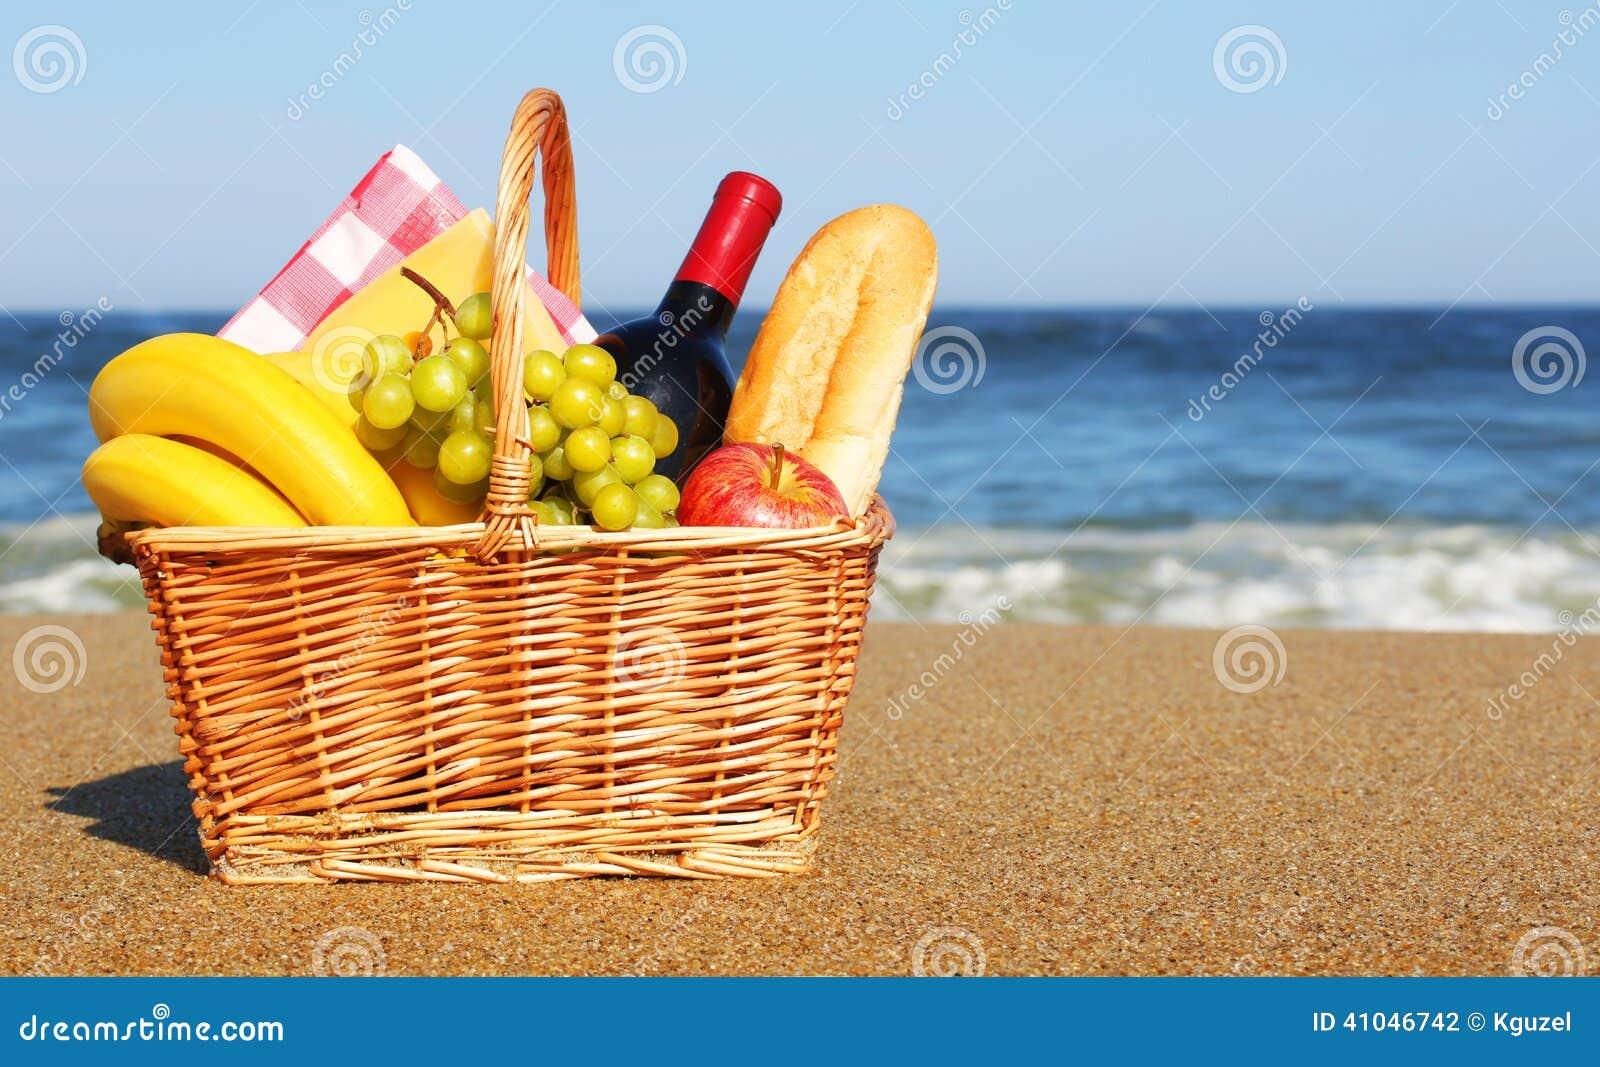 Picnic Basket Food : Picnic basket with food on beach stock photo image